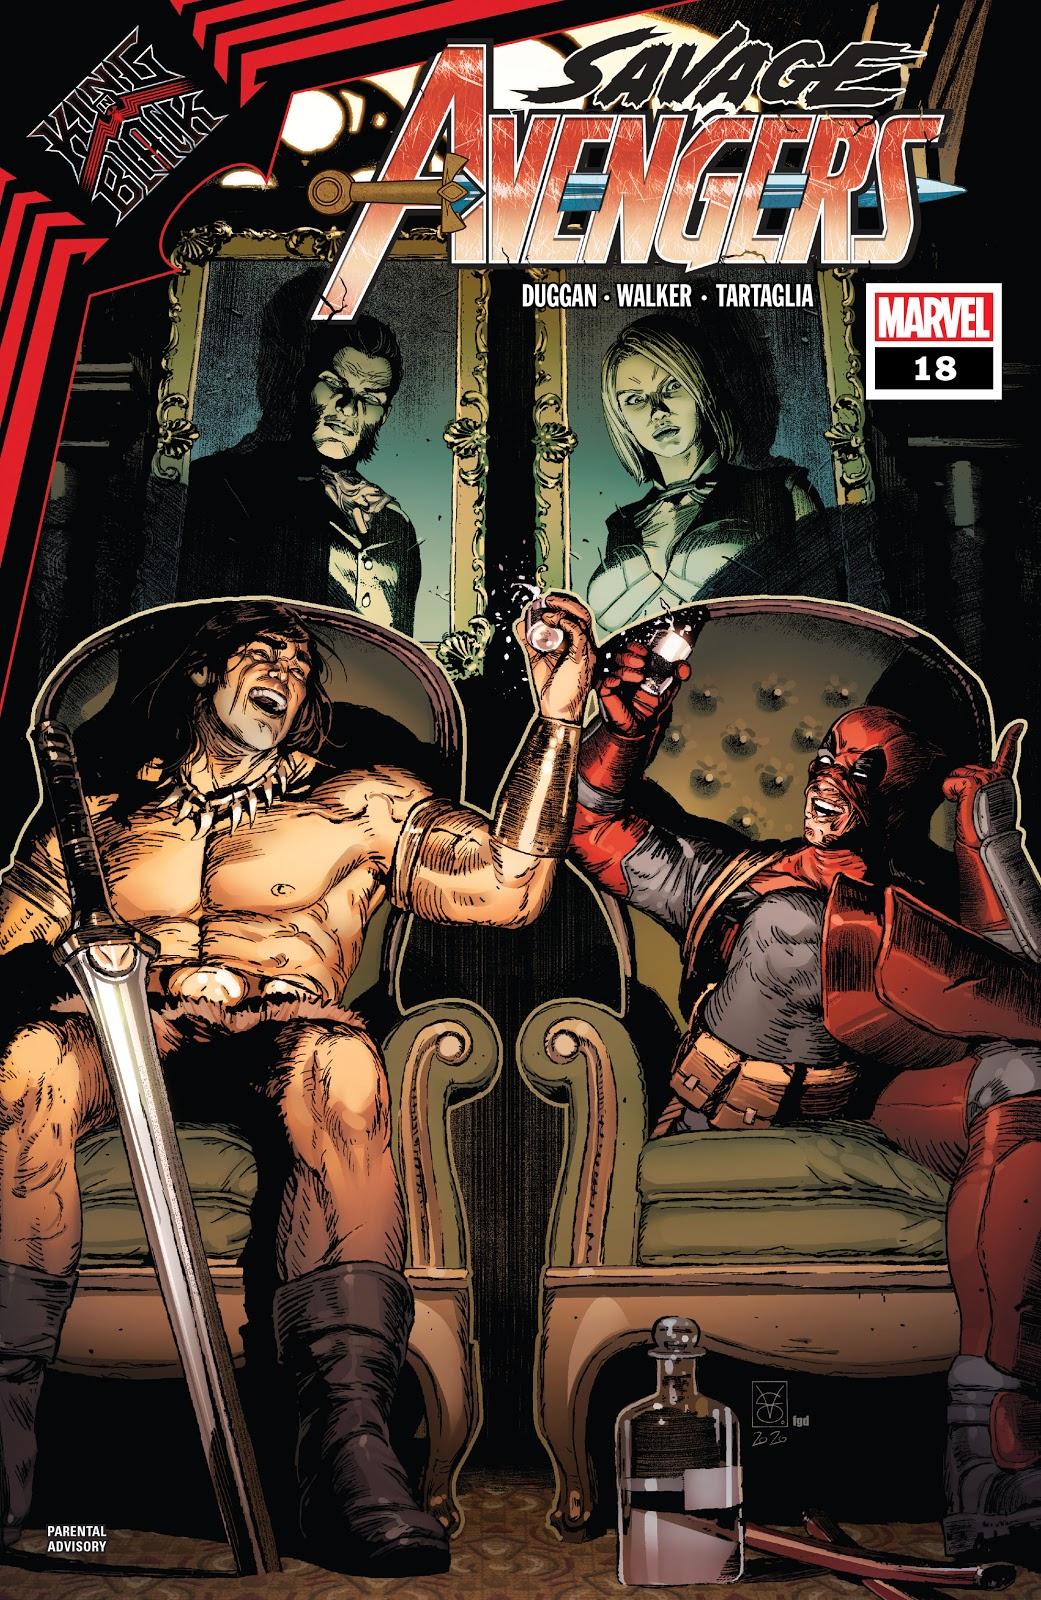 Conan The Barbarian Uses a Human Shield Against TheX-Men!